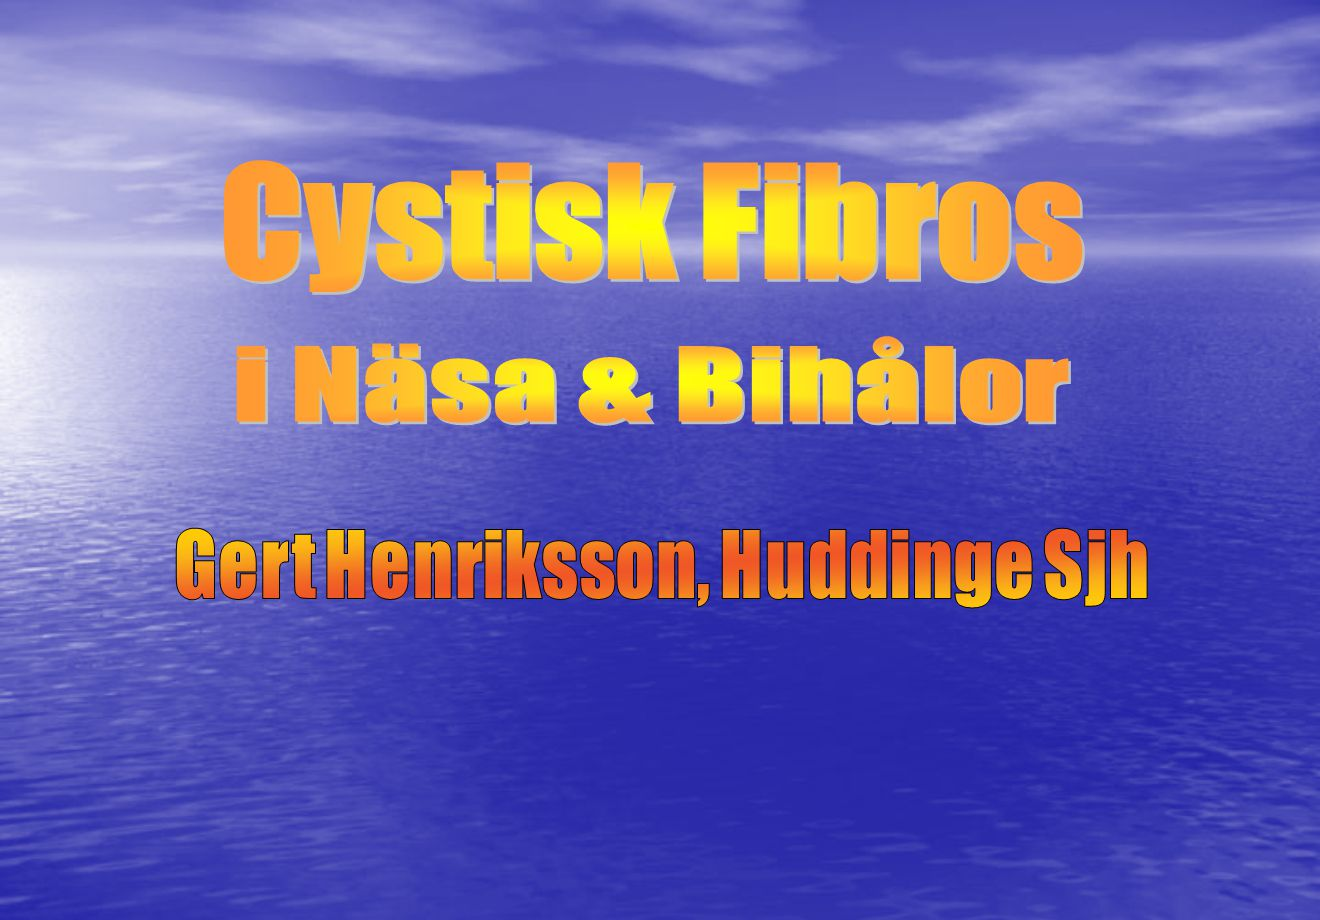 Gert Henriksson, Huddinge Sjh